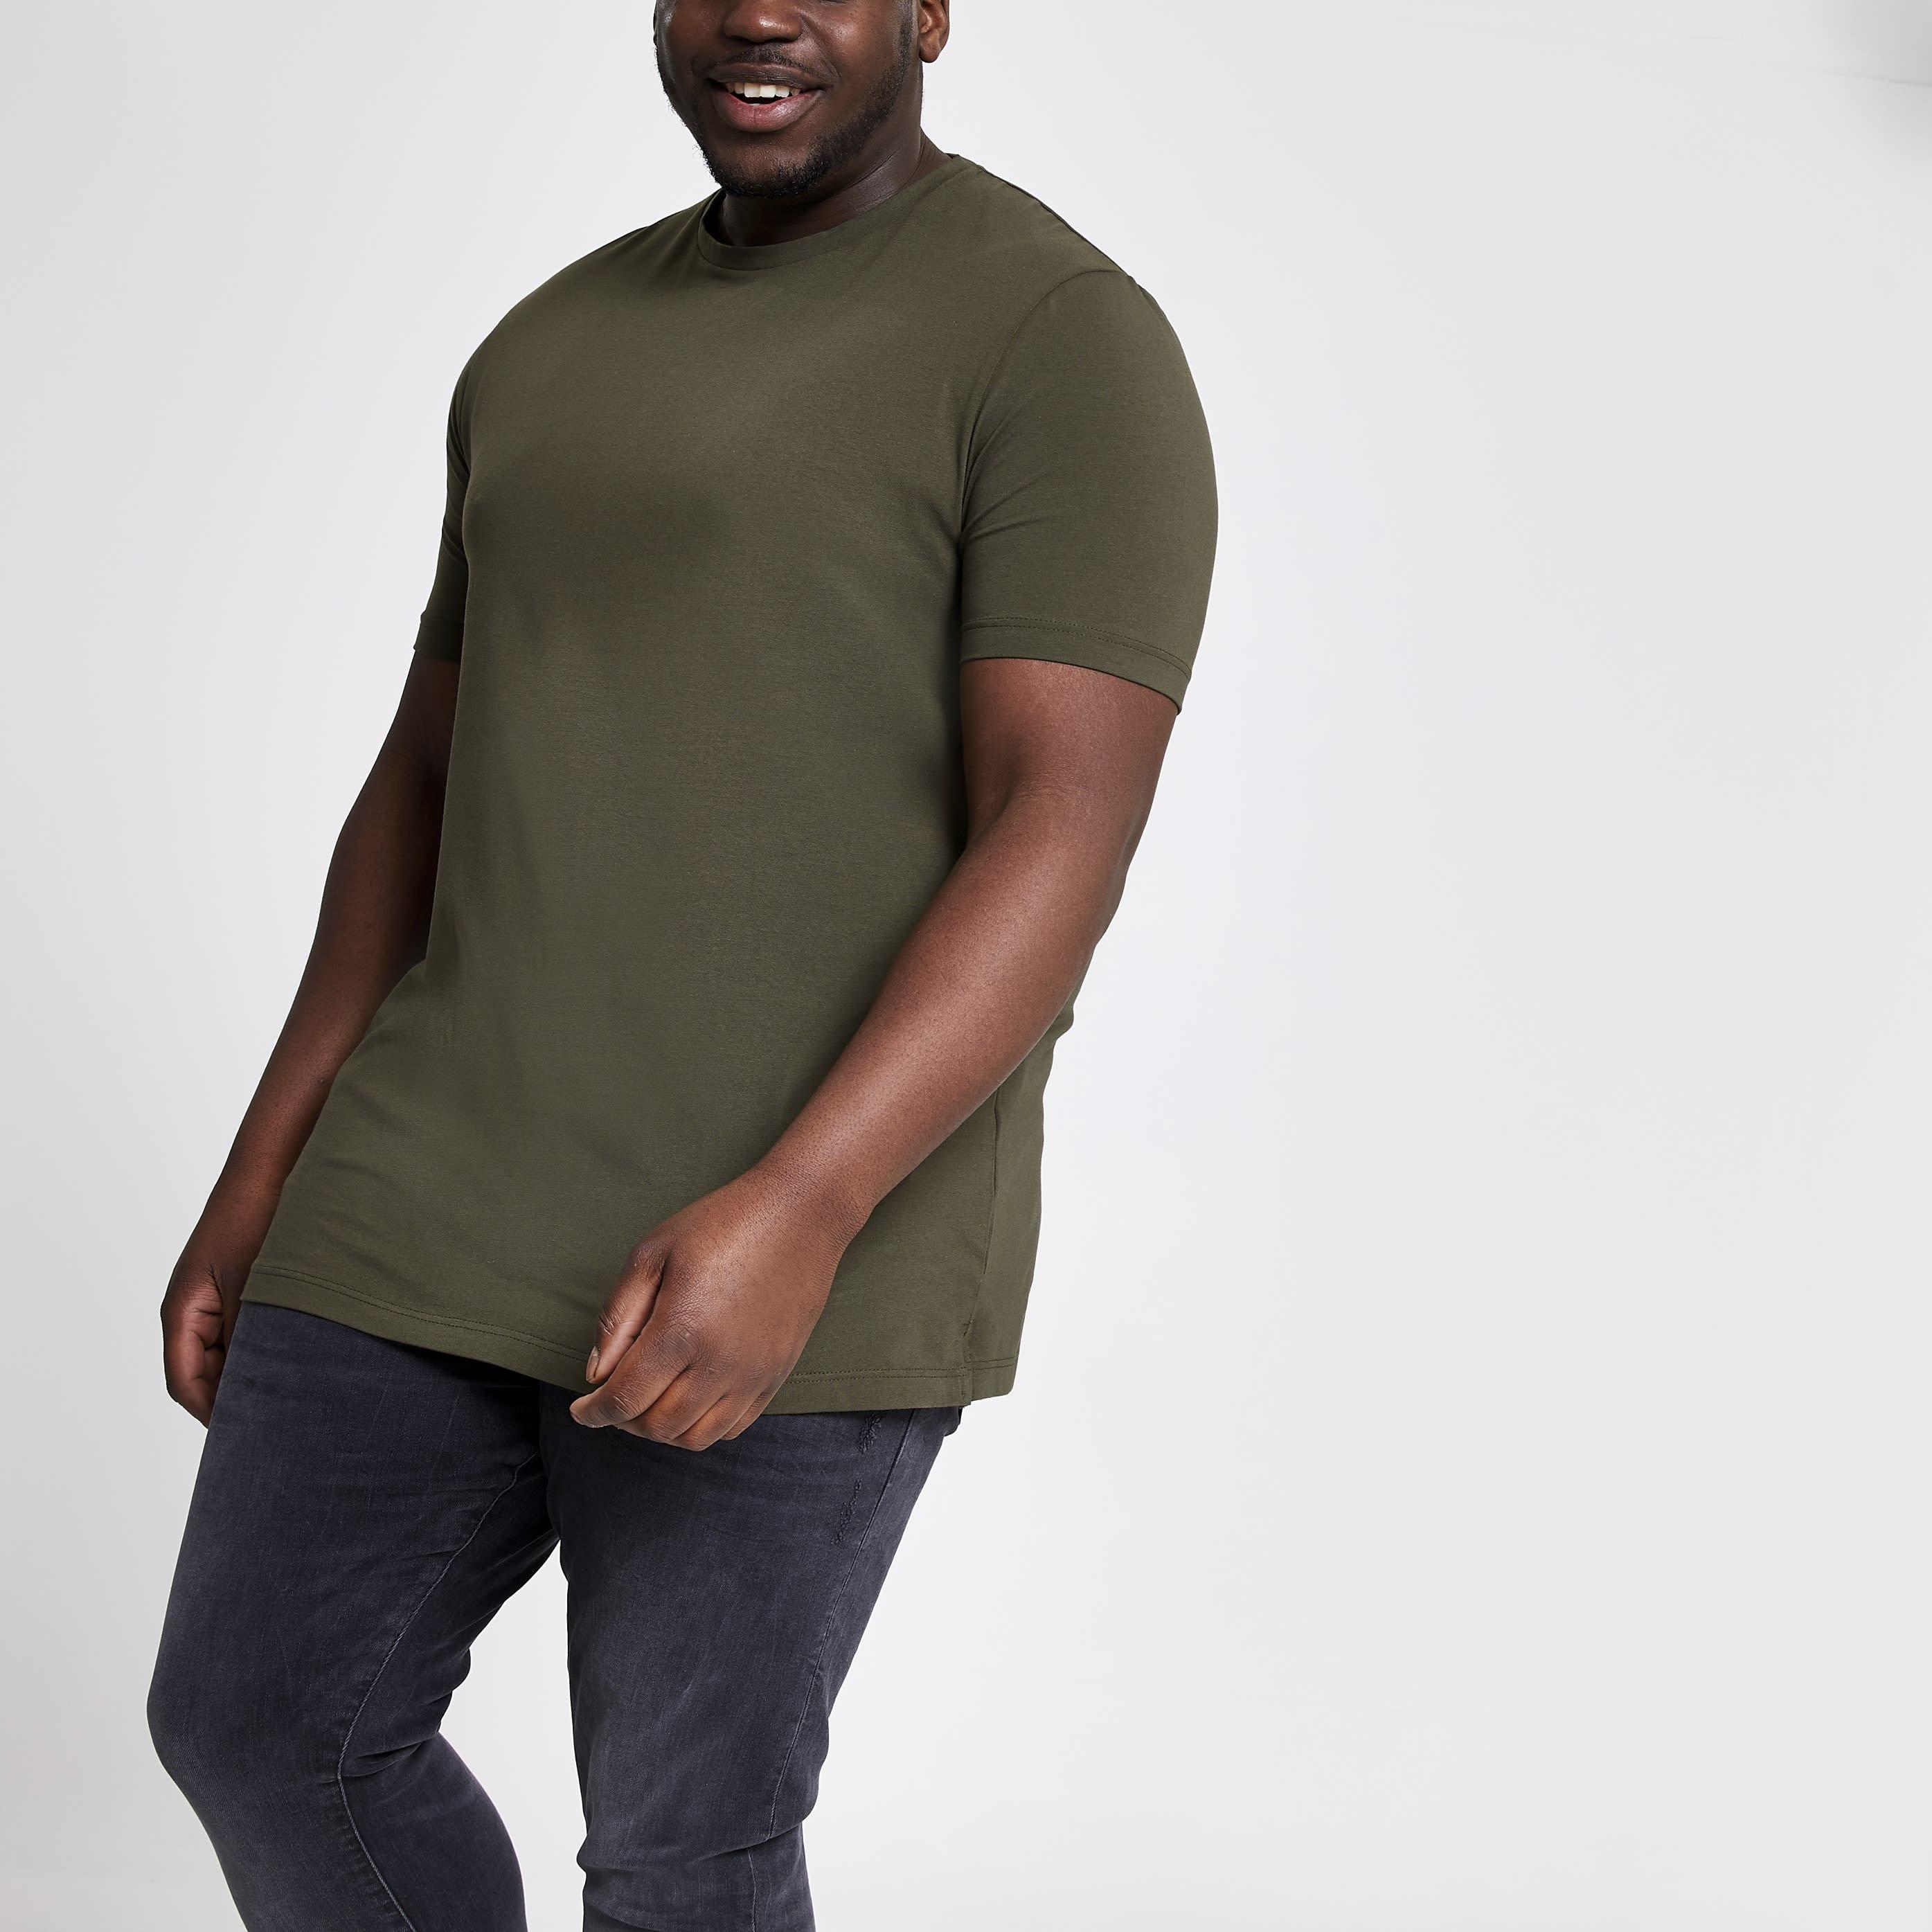 River Island Mens Big and Tall dark Green muscle fit T-shirt (XXXXXXL)